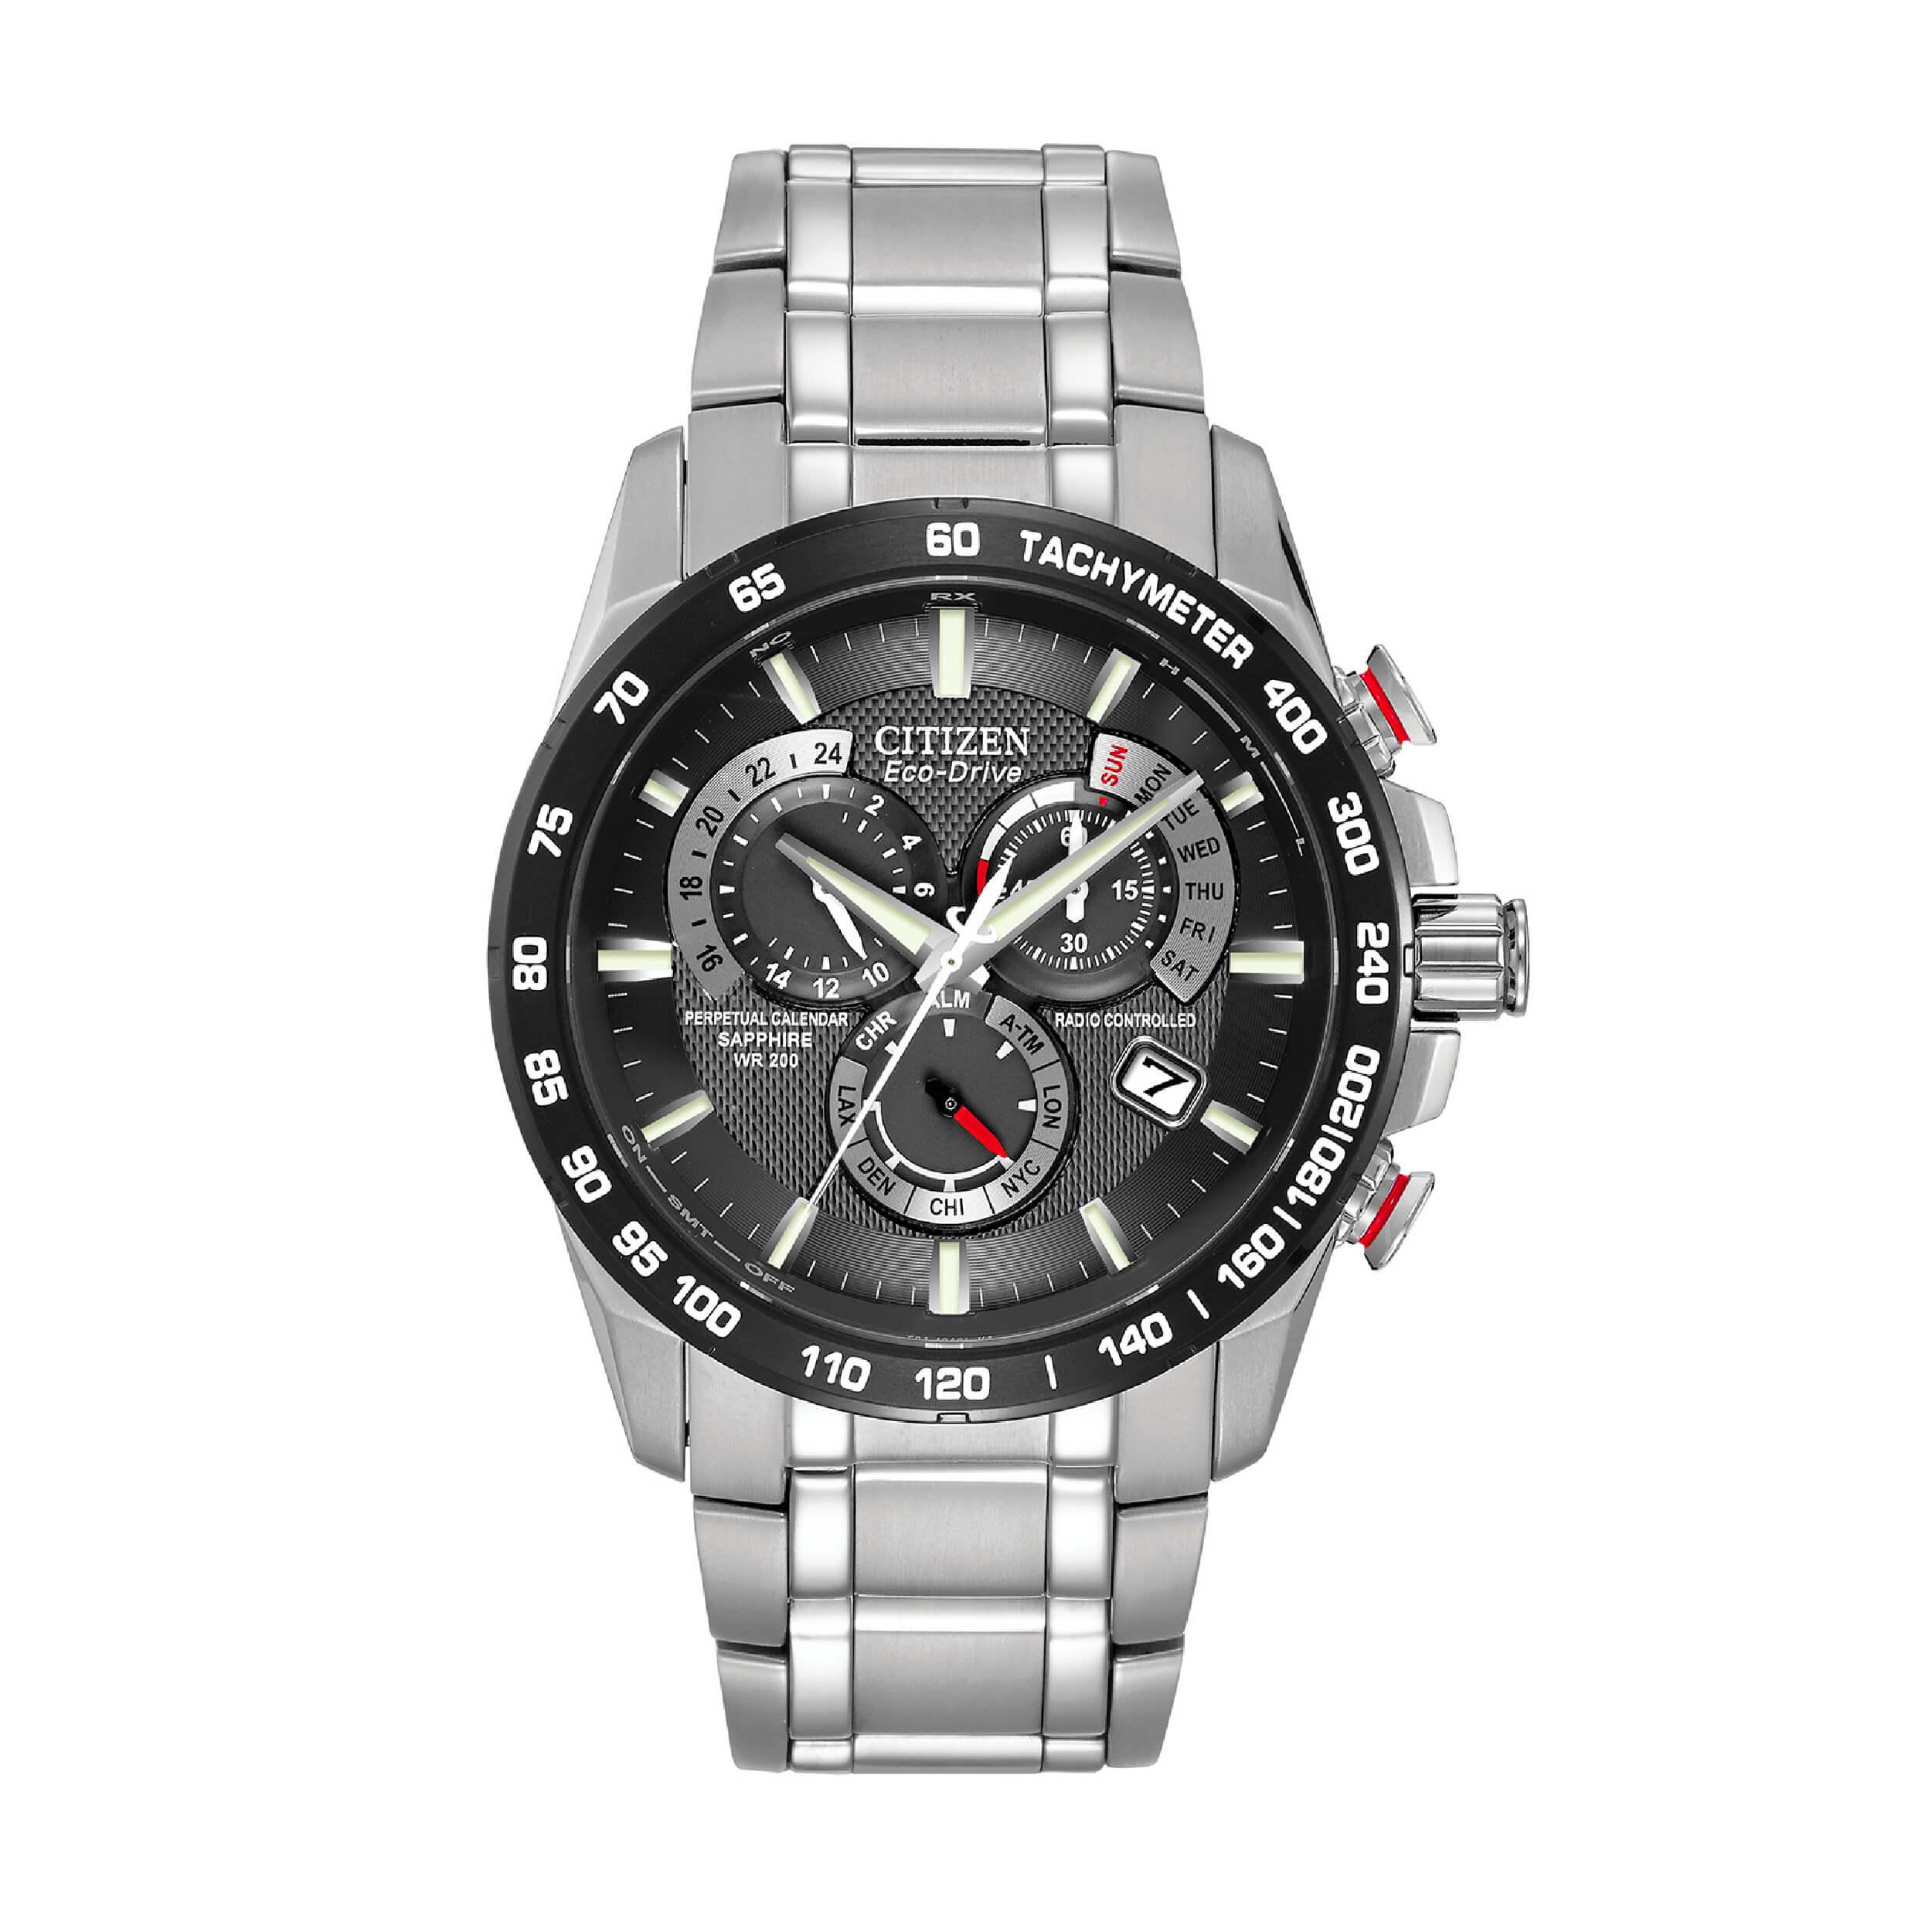 Citizen eco-drive Perpetual Chronograph | Best Chronograph Watch Under £500